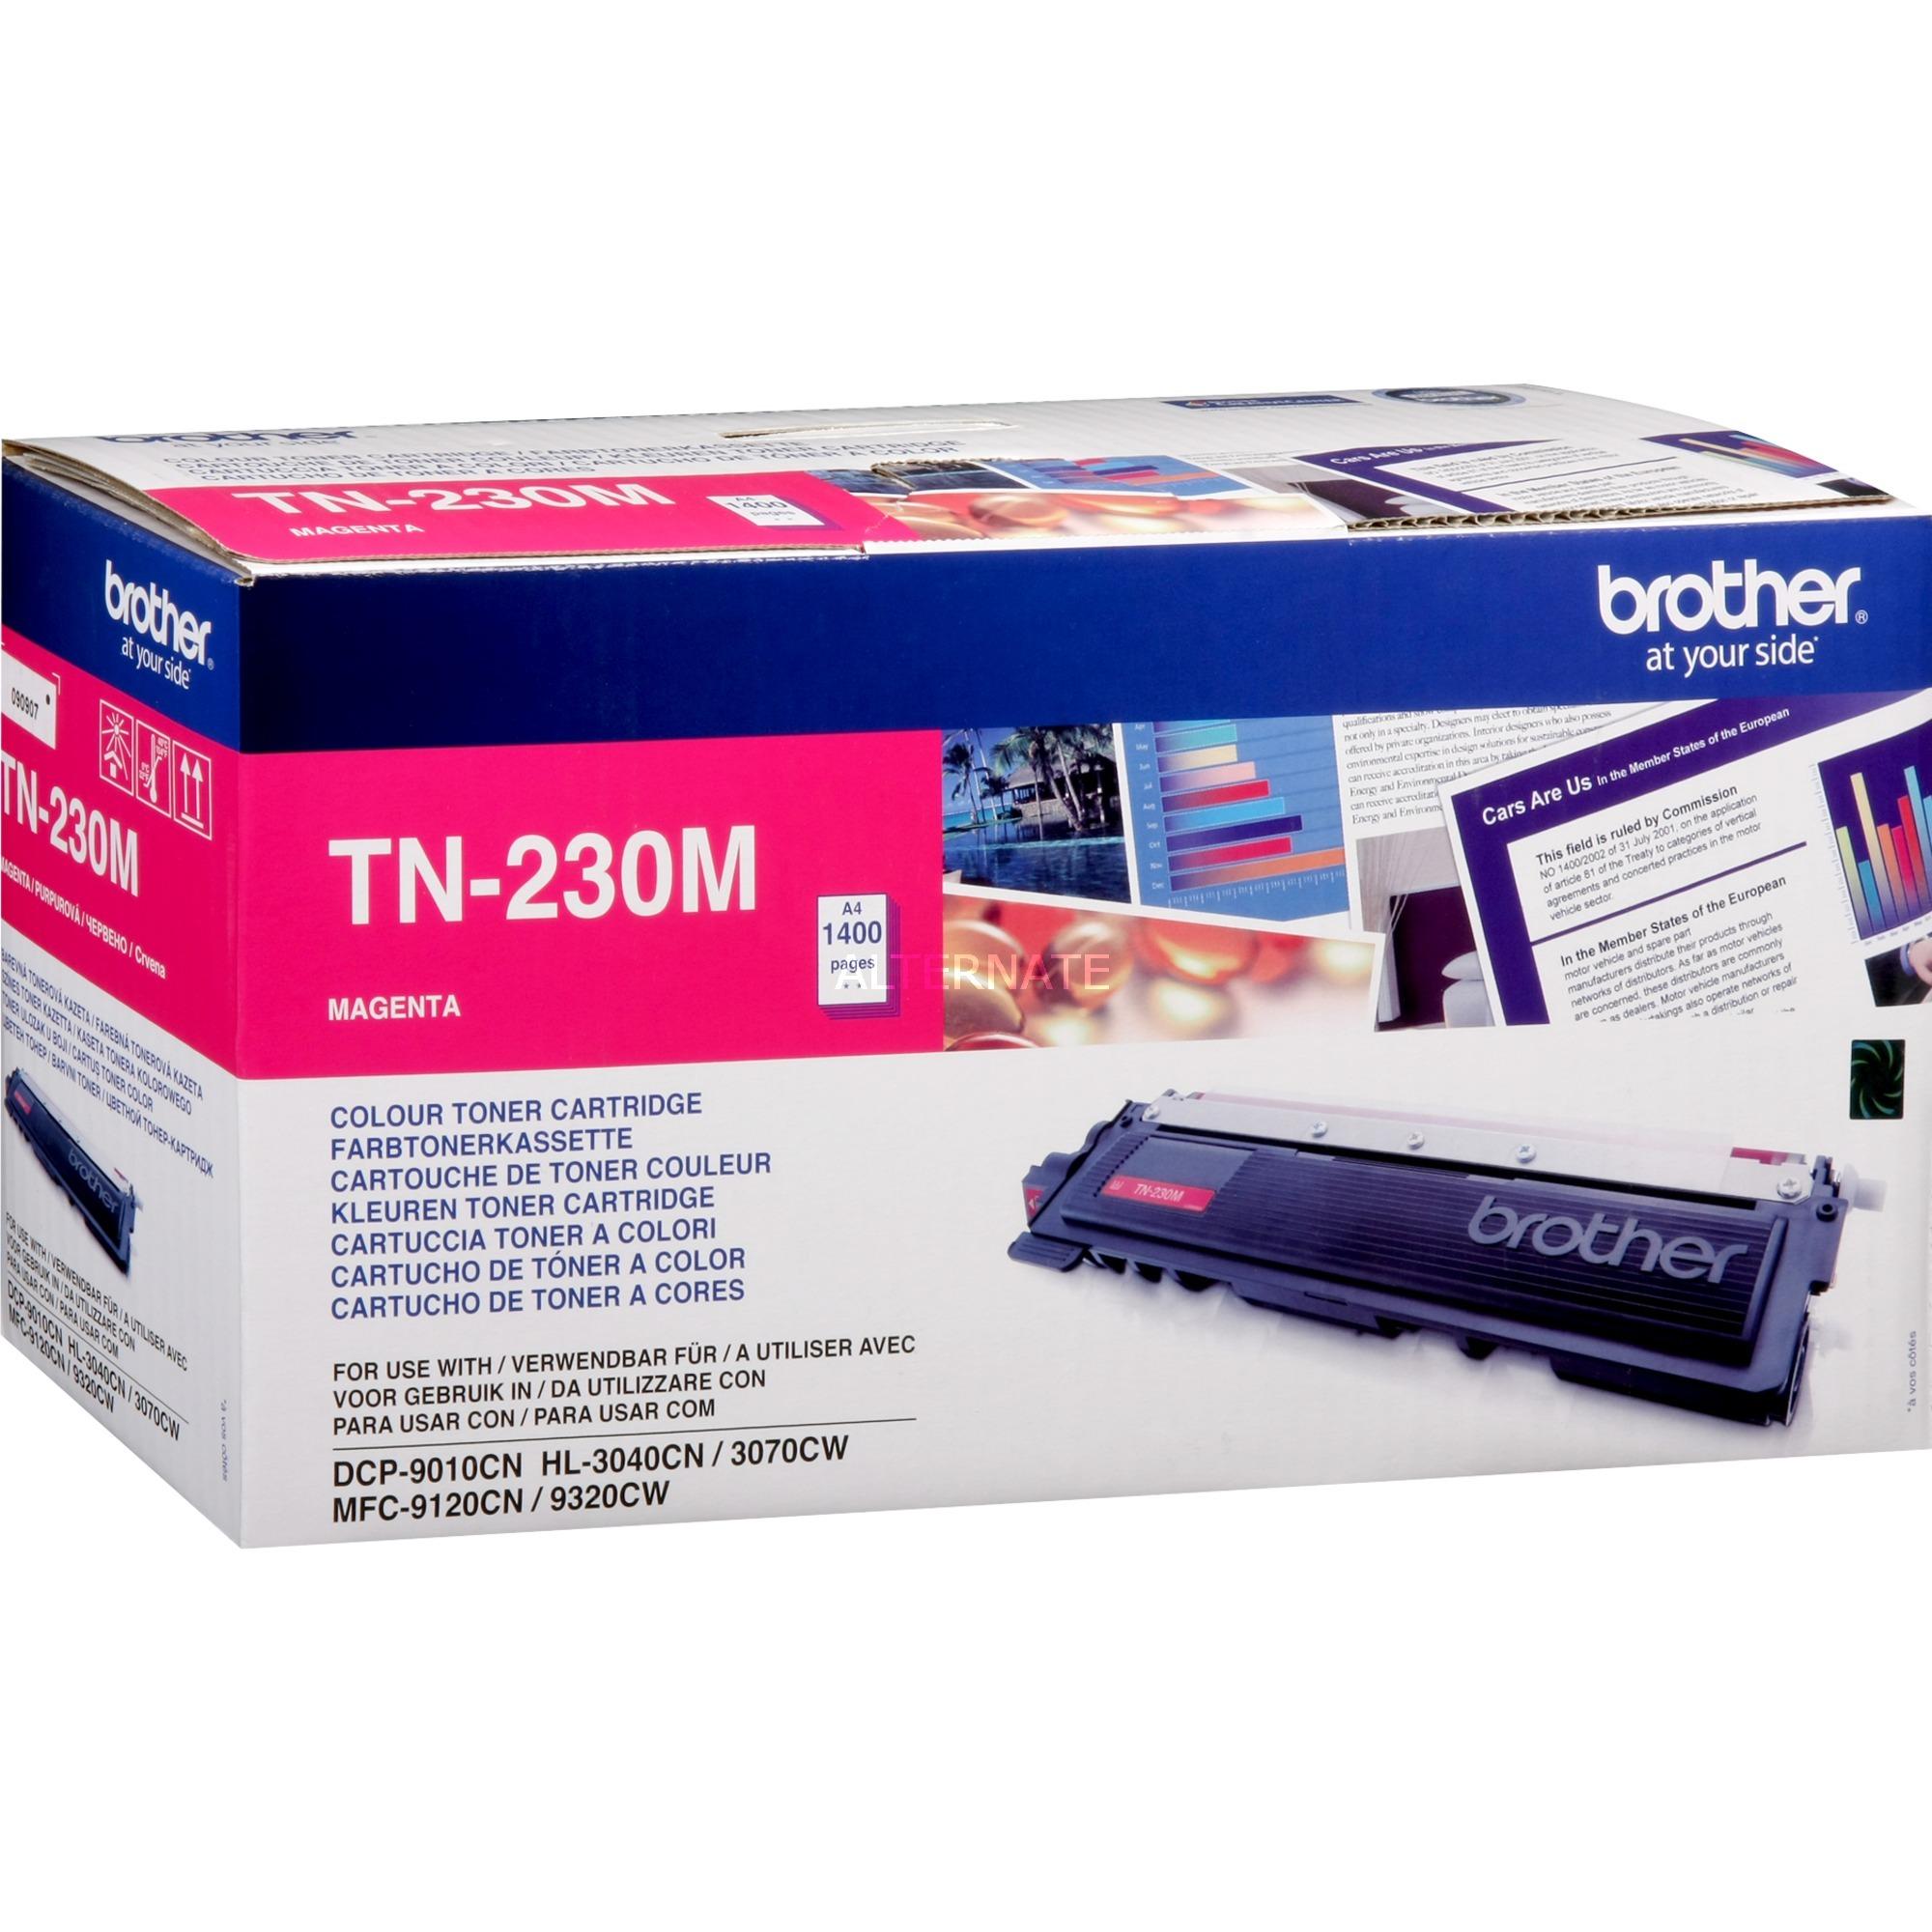 TN-230M - Toner Magenta